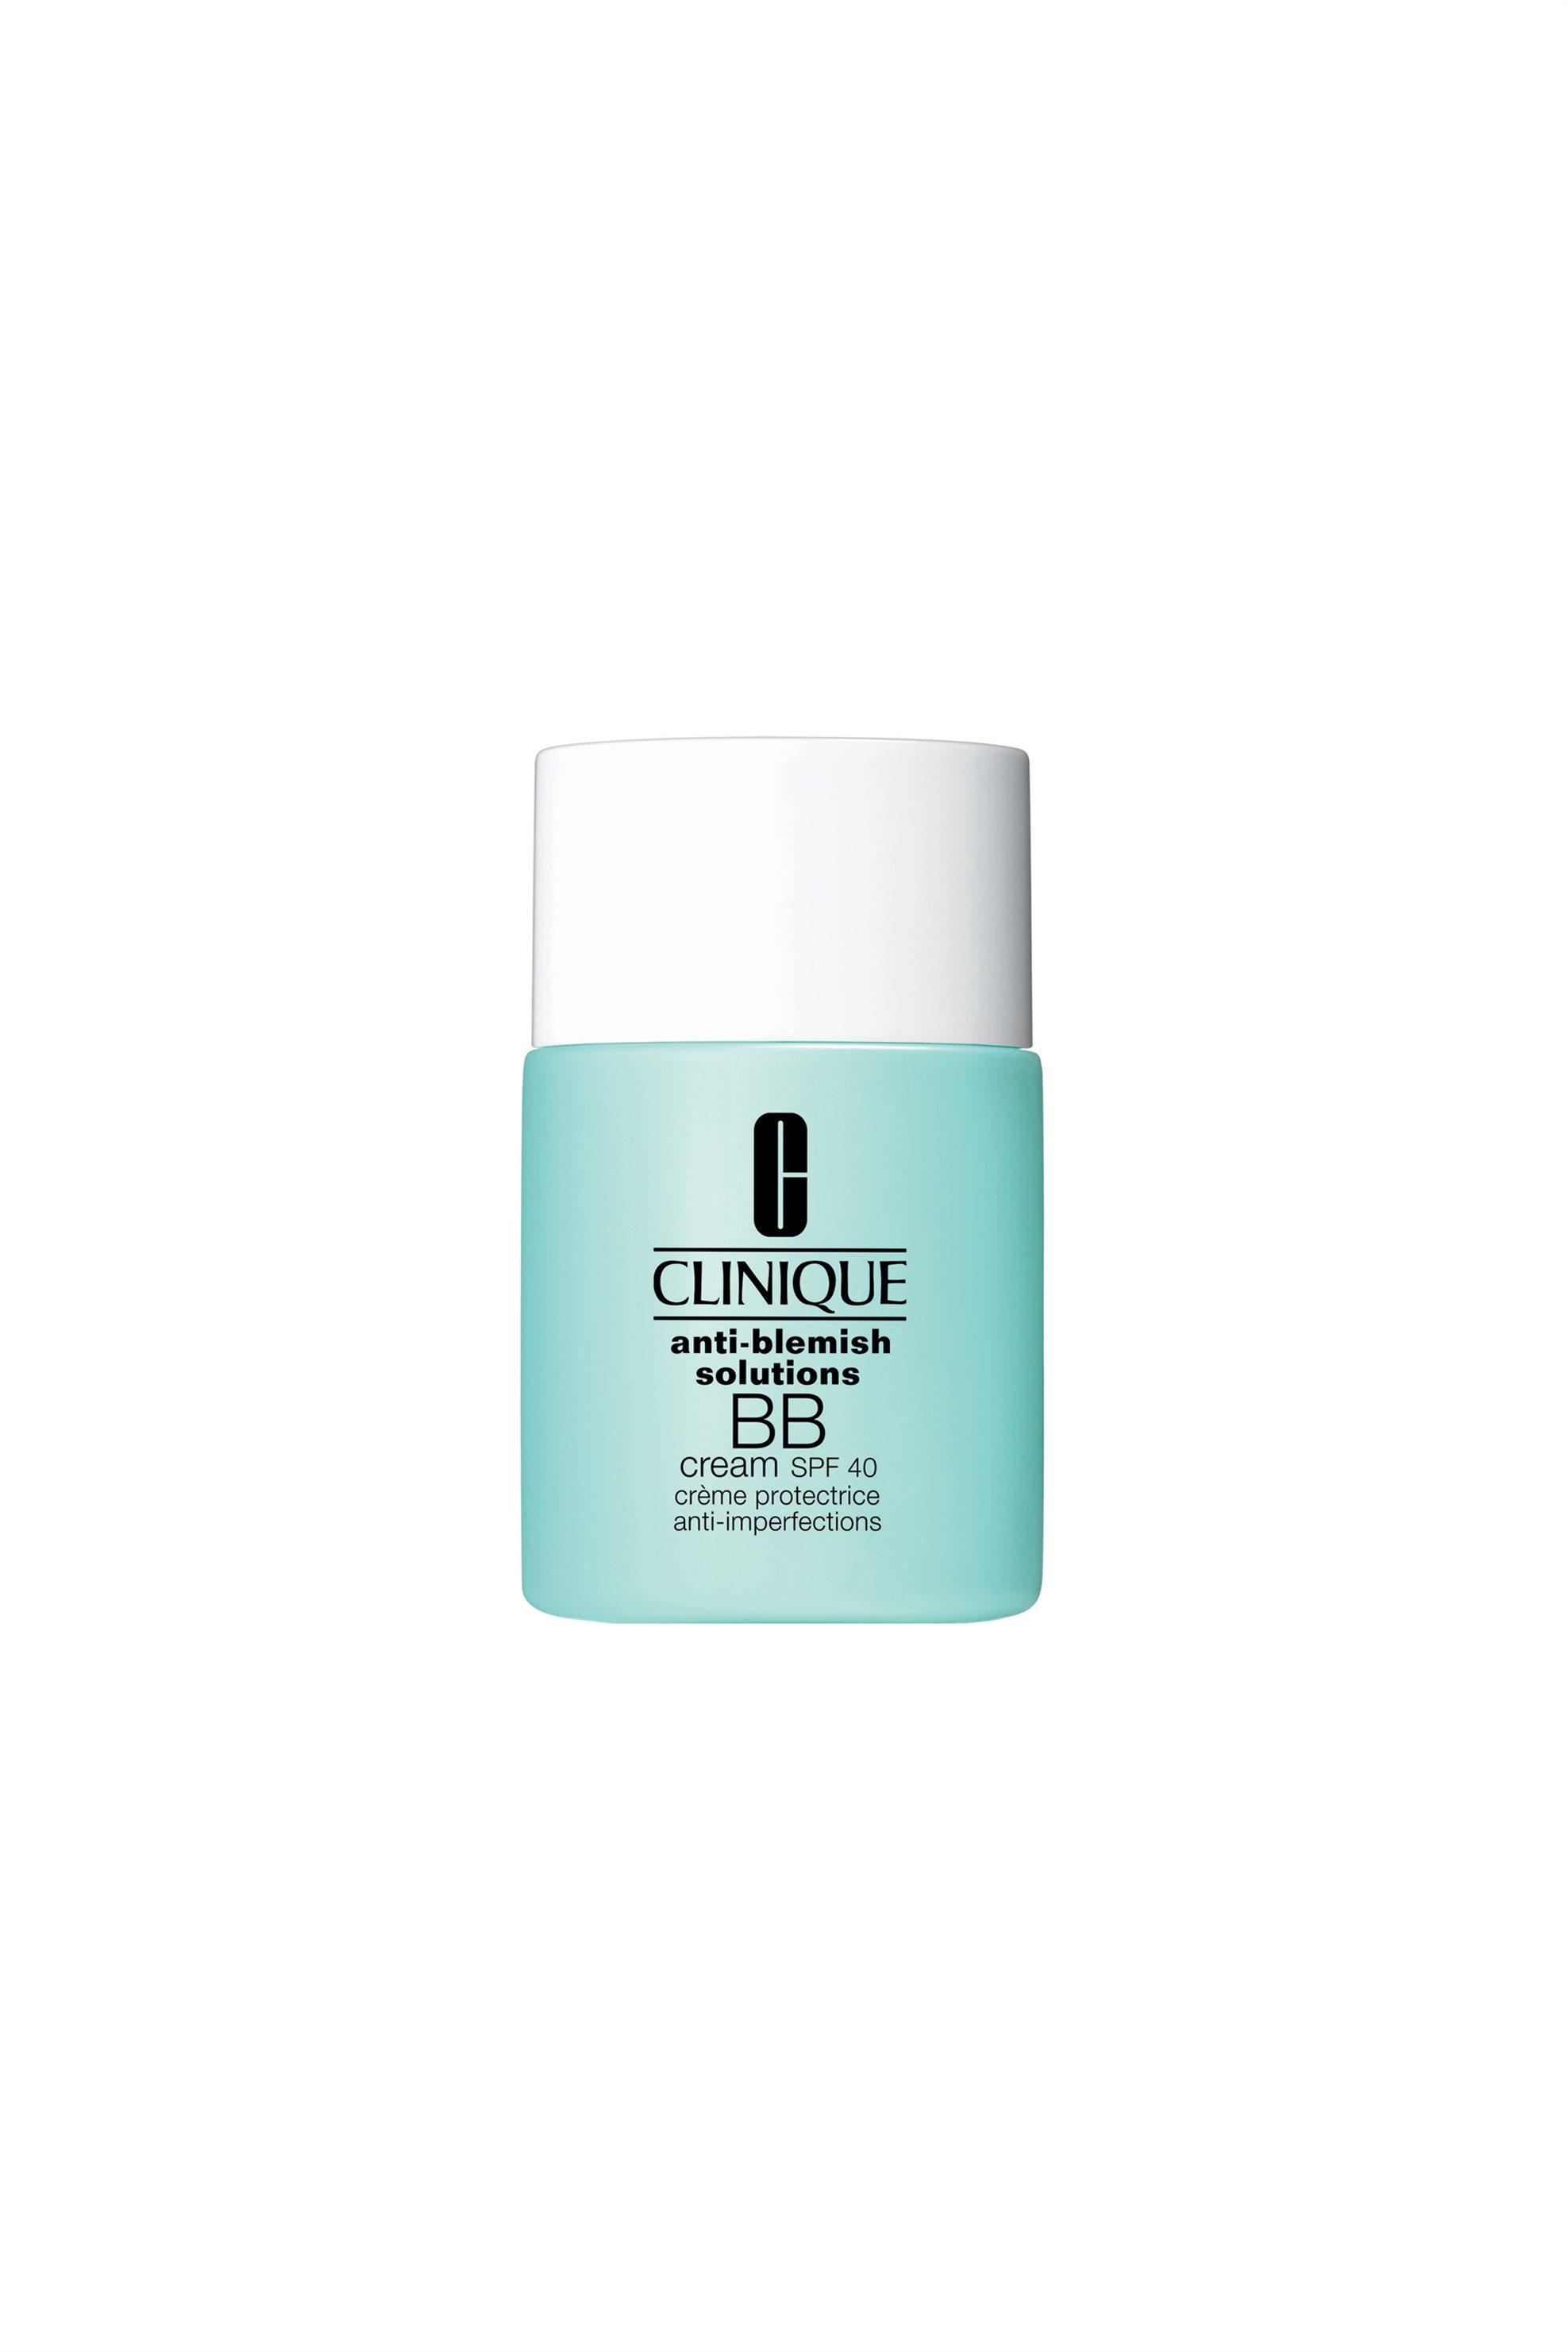 Clinique Acne Solutions BB Cream Broad Spectrum SPF40 Deep 30 ml - Z54E050000 ομορφια   καλλυντικα επιλεκτικησ   περιποίηση προσώπου   κρέμες ημέρας   bb crea